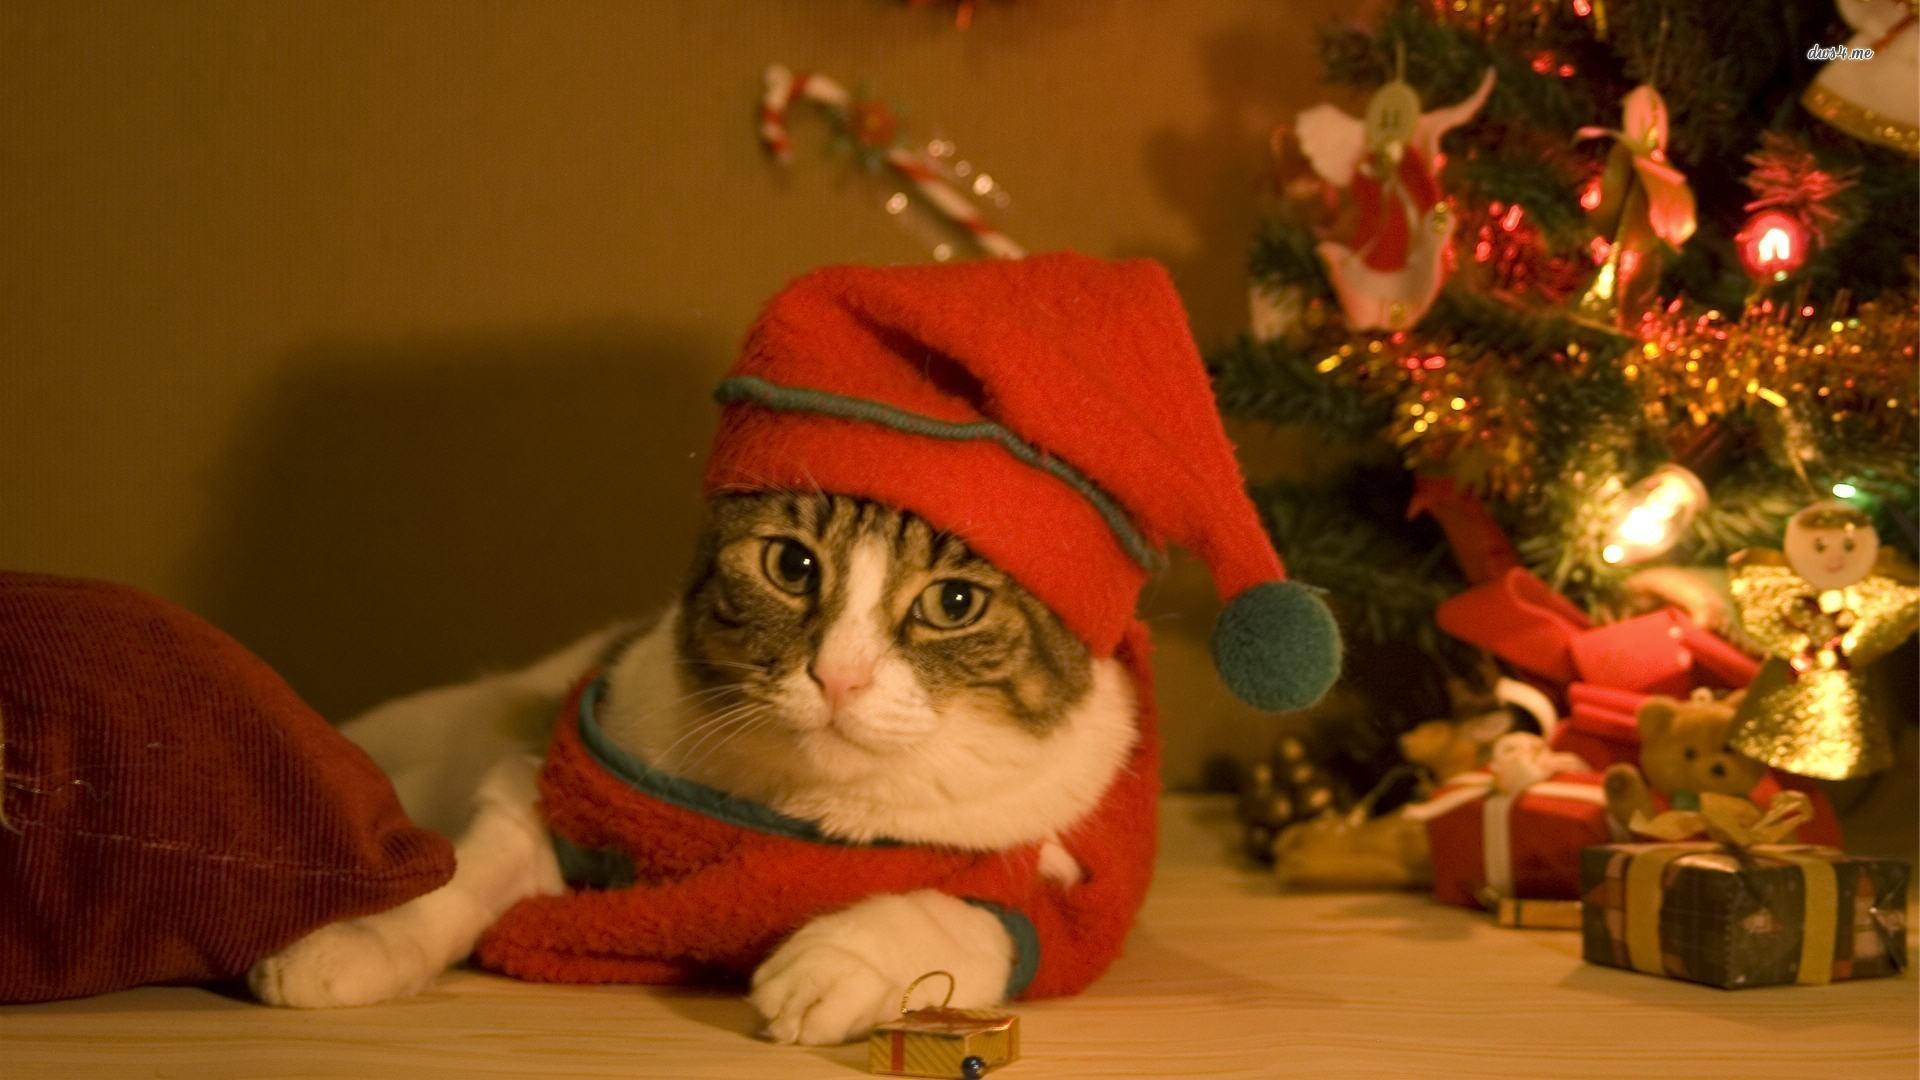 Cute Siamese Kittens Wallpaper Christmas Cat Wallpaper 183 ① Wallpapertag